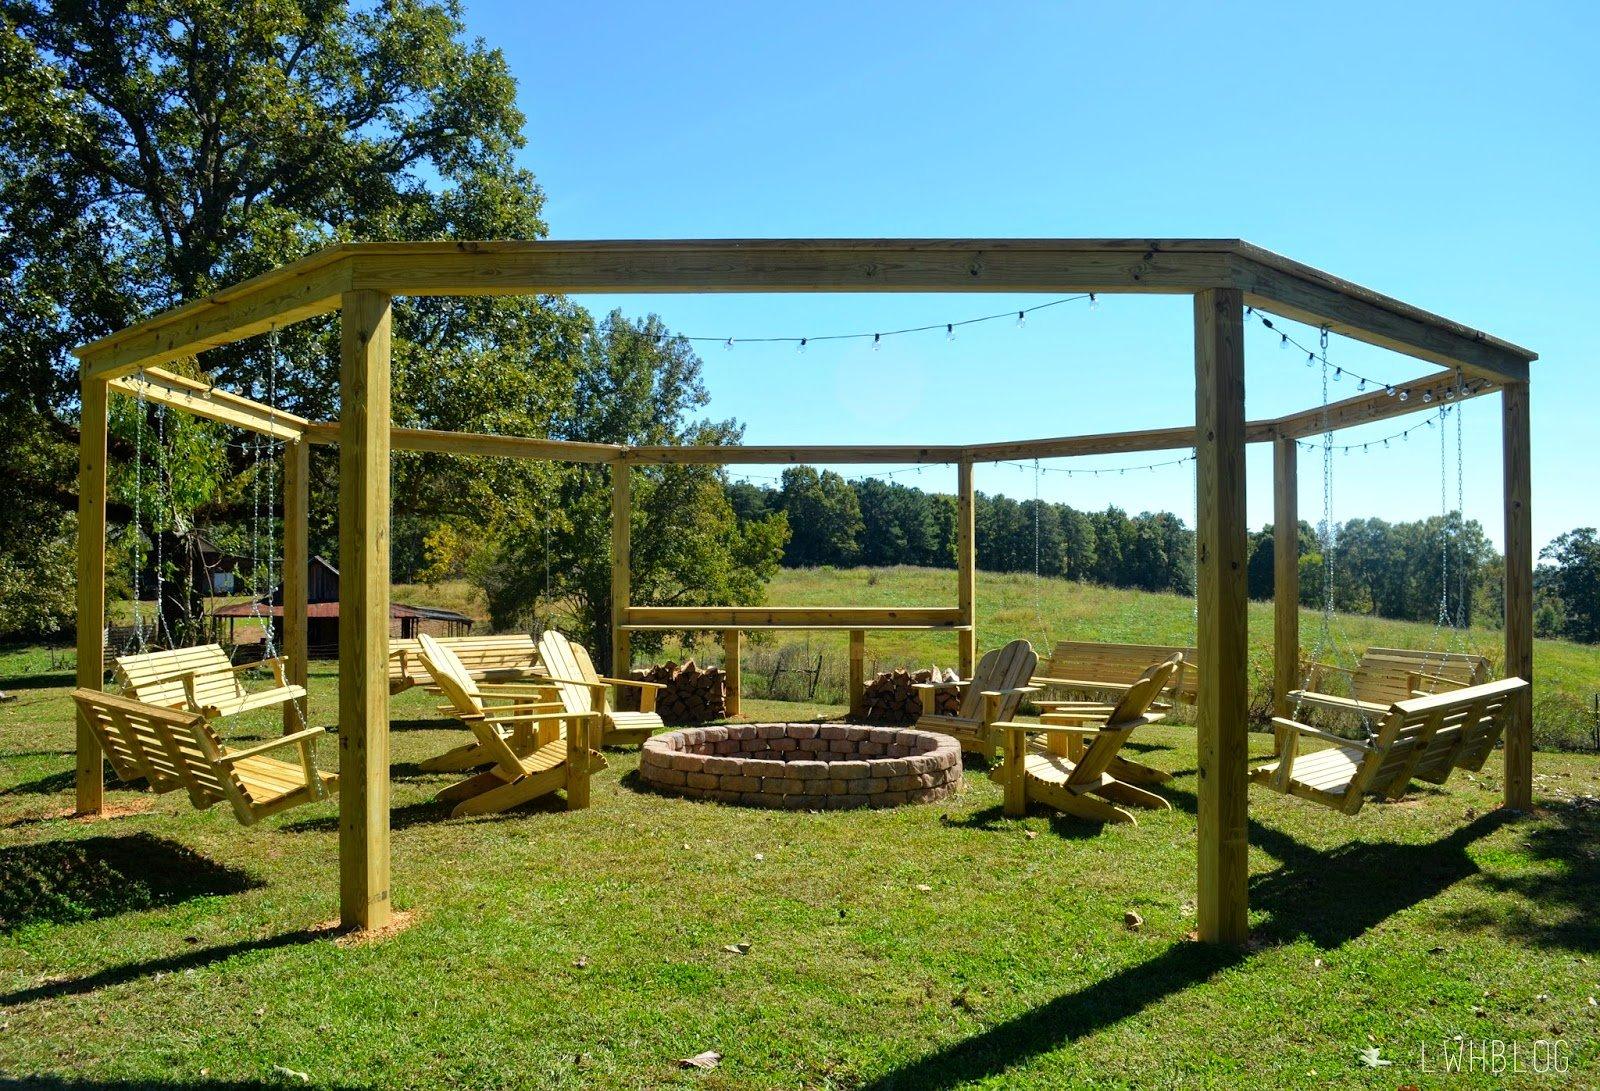 Remodelaholic | Tutorial: Build an Amazing DIY Pergola for ...